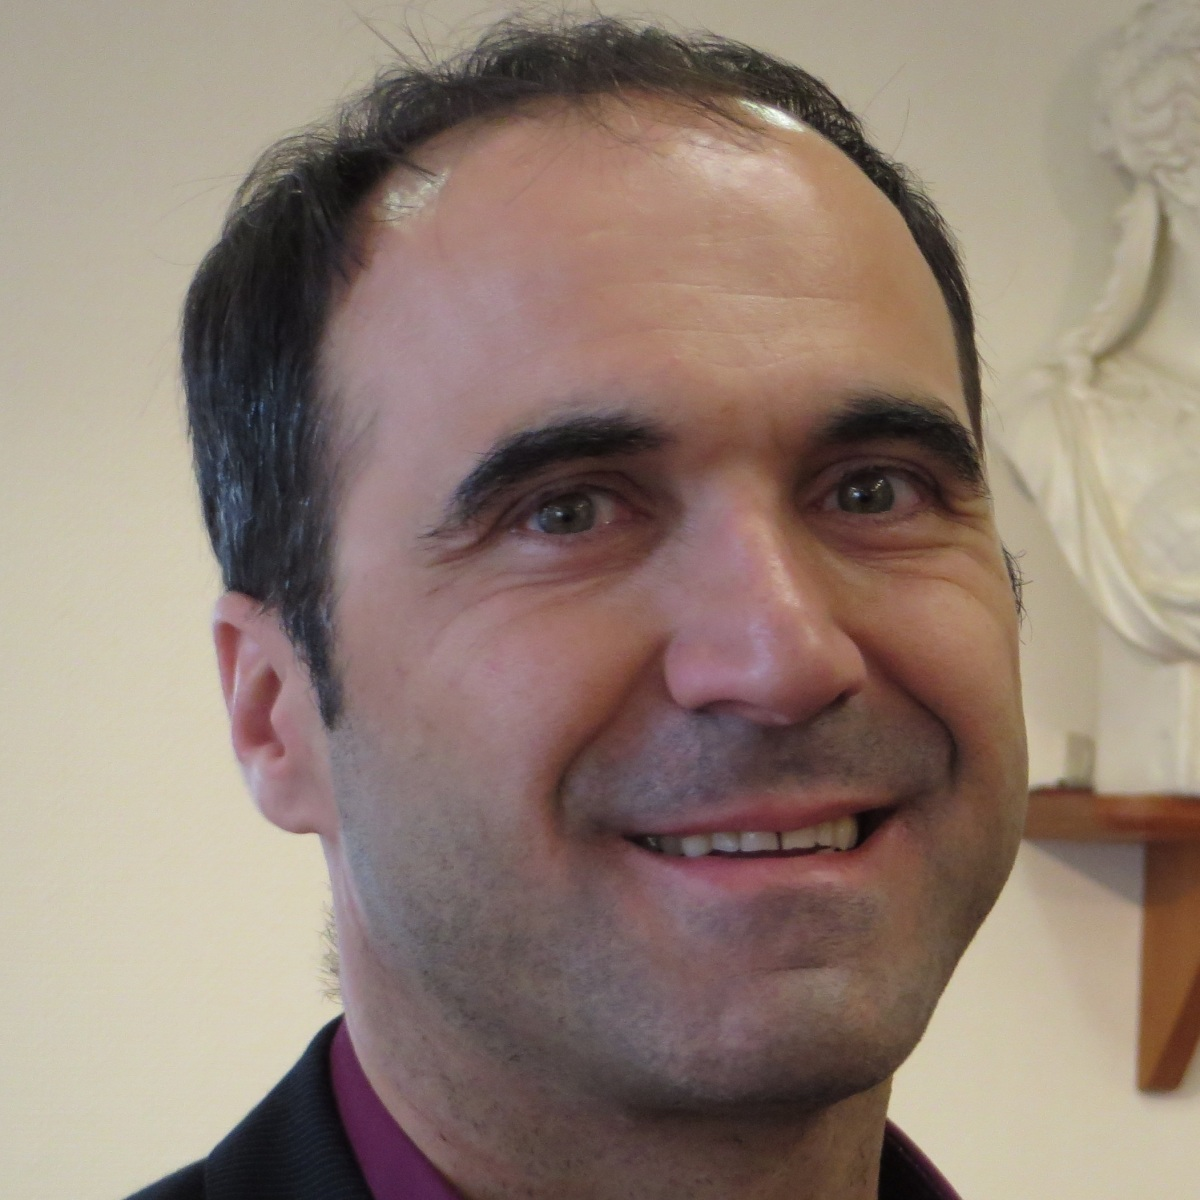 Grégory Munoz